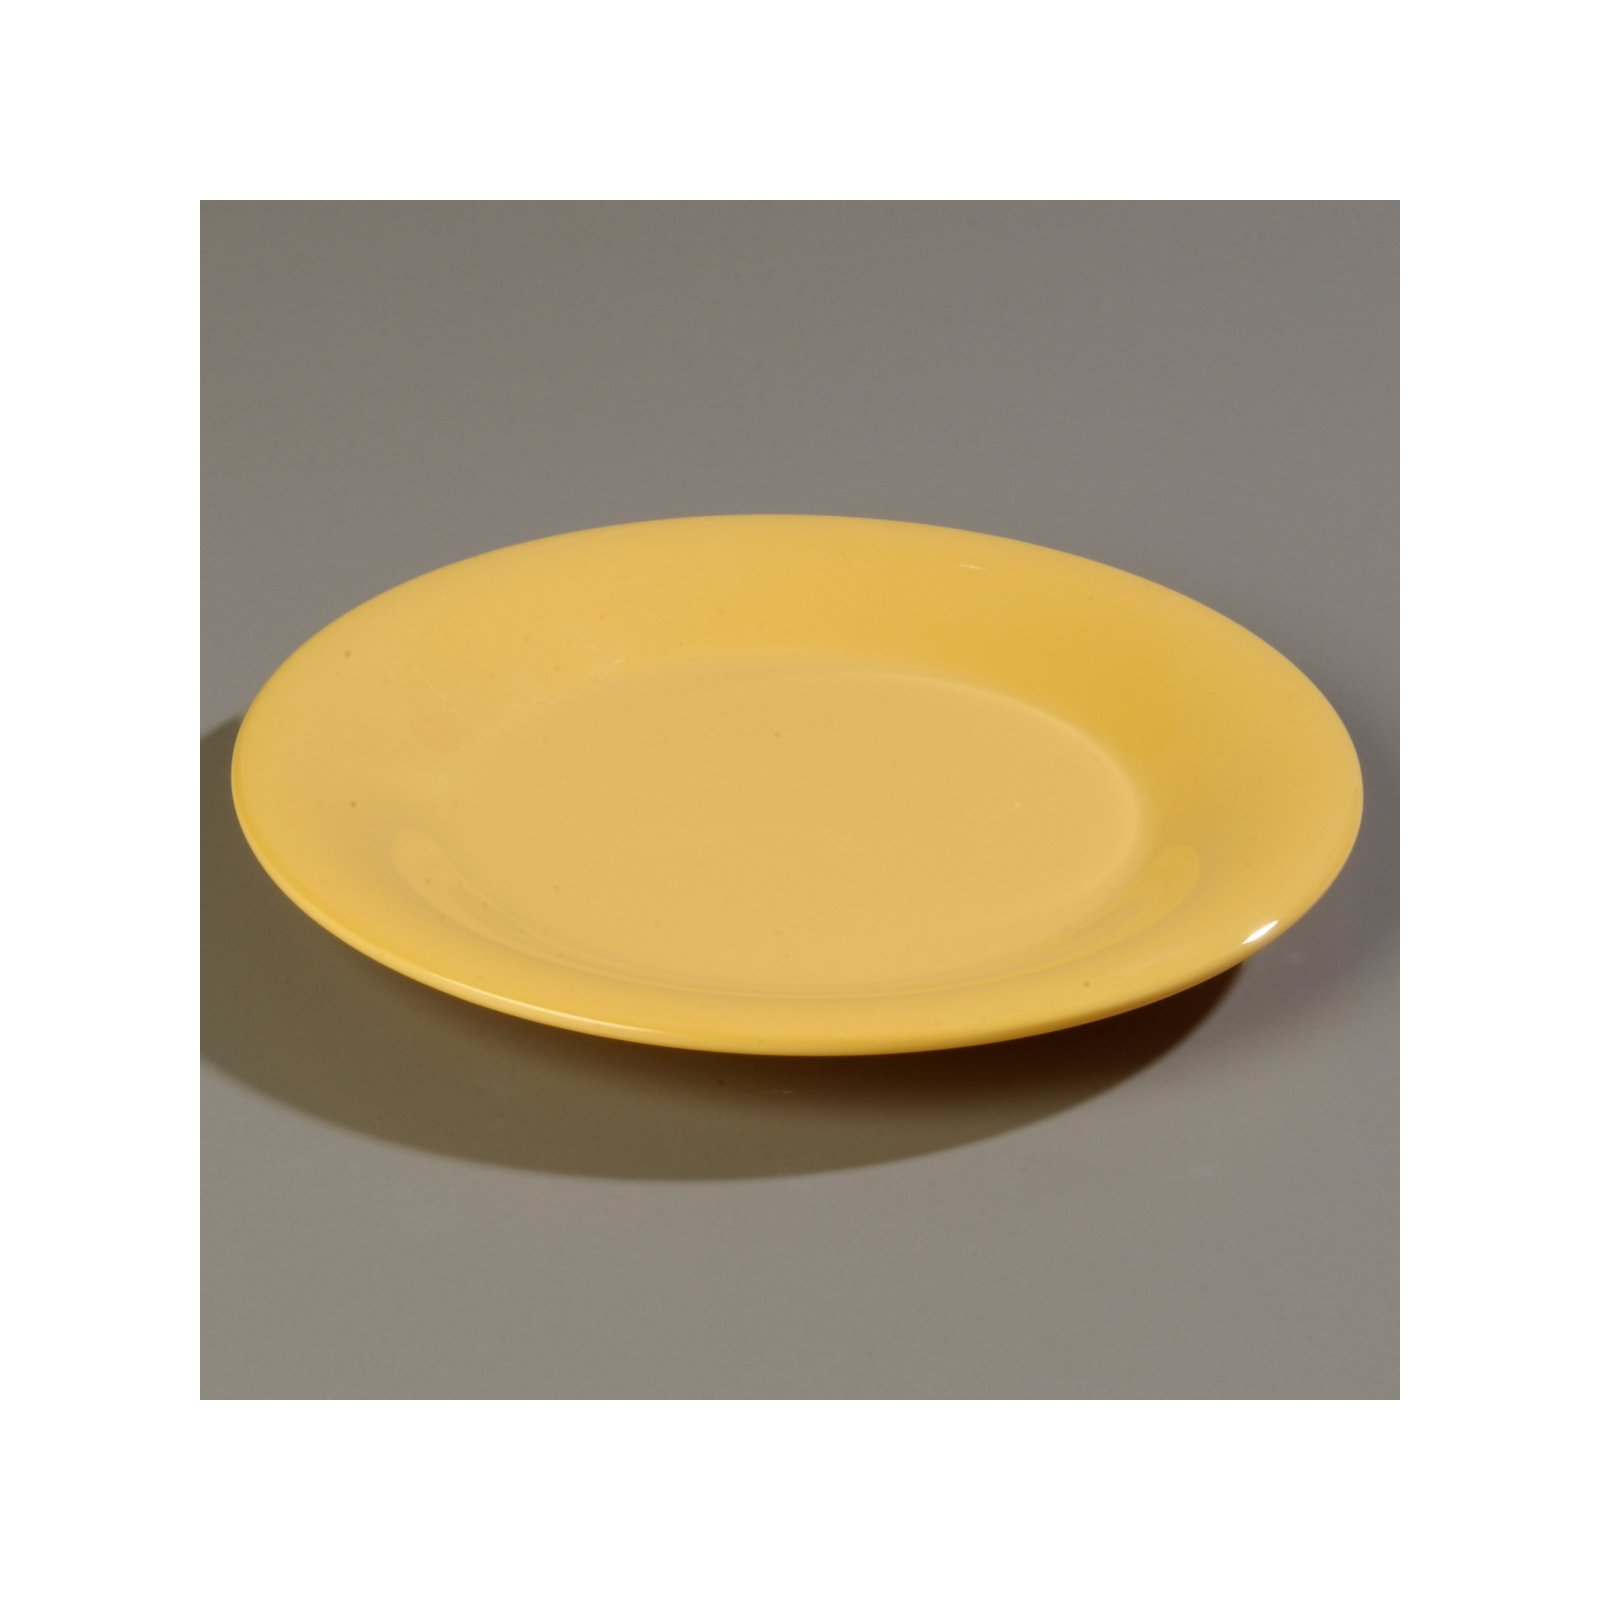 ... 3301622 - Sierrus™ Melamine Wide Rim Salad Plat 7.5\  - Honey Yellow  sc 1 st  Carlisle FoodService Products & 3301622 - Sierrus™ Melamine Wide Rim Salad Plat 7.5\